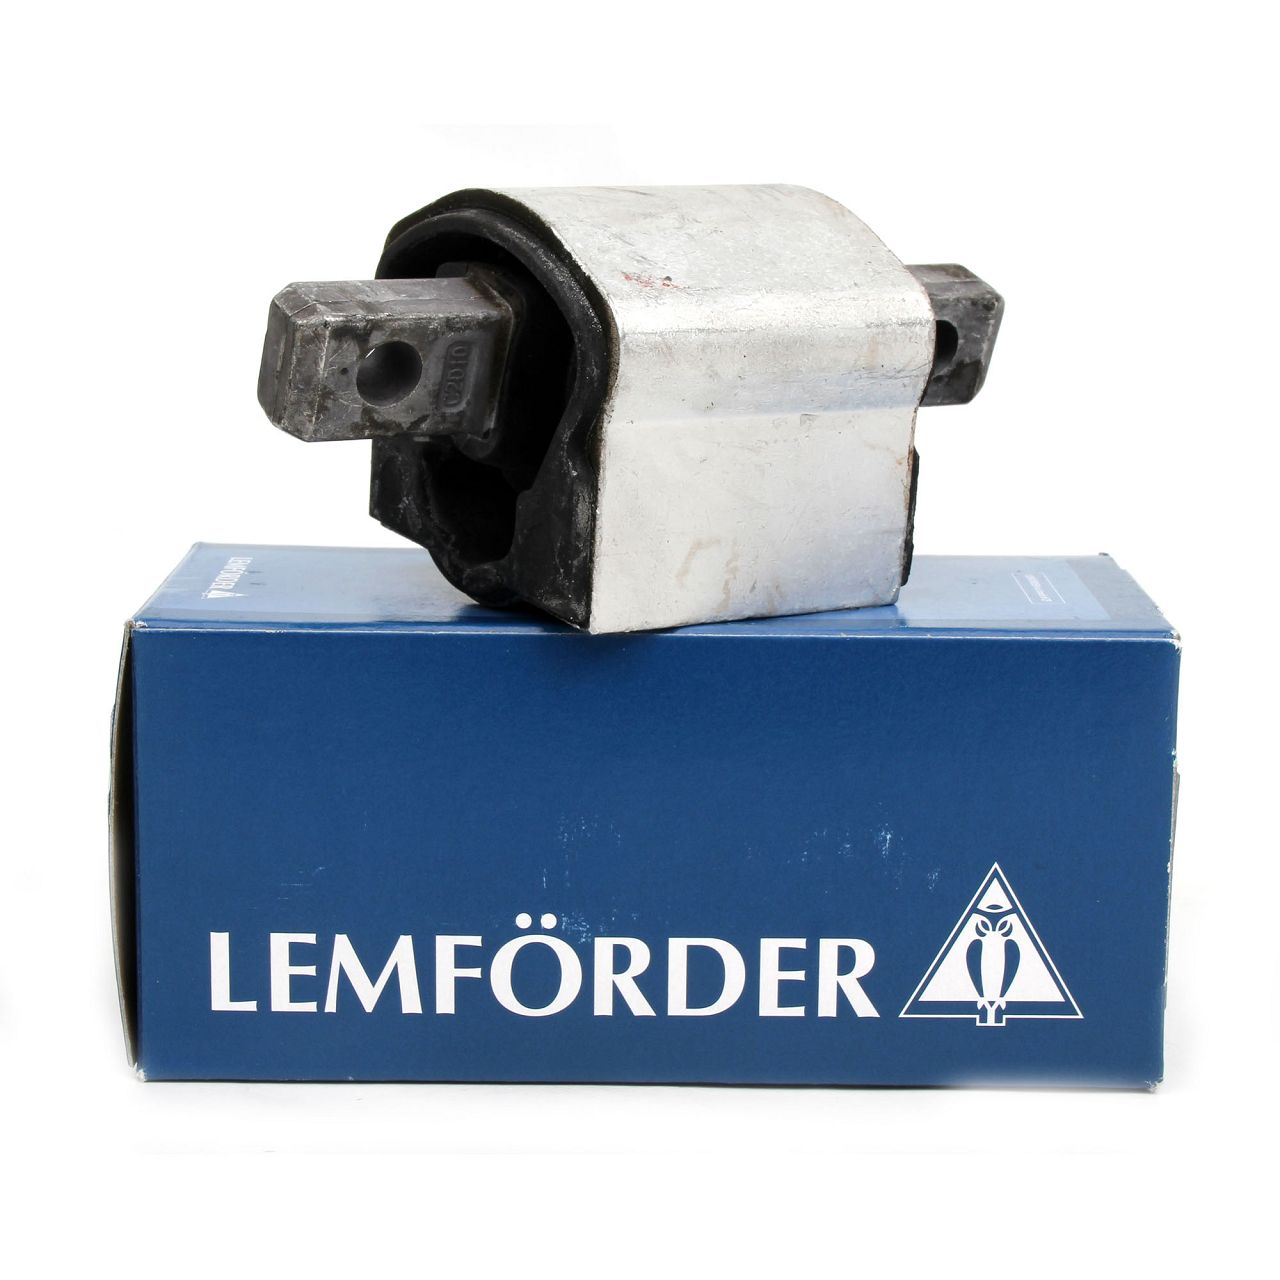 LEMFÖRDER 3387501 Getriebelager MERCEDES W202 W203 W210 W211 W140 W220 R129 R170